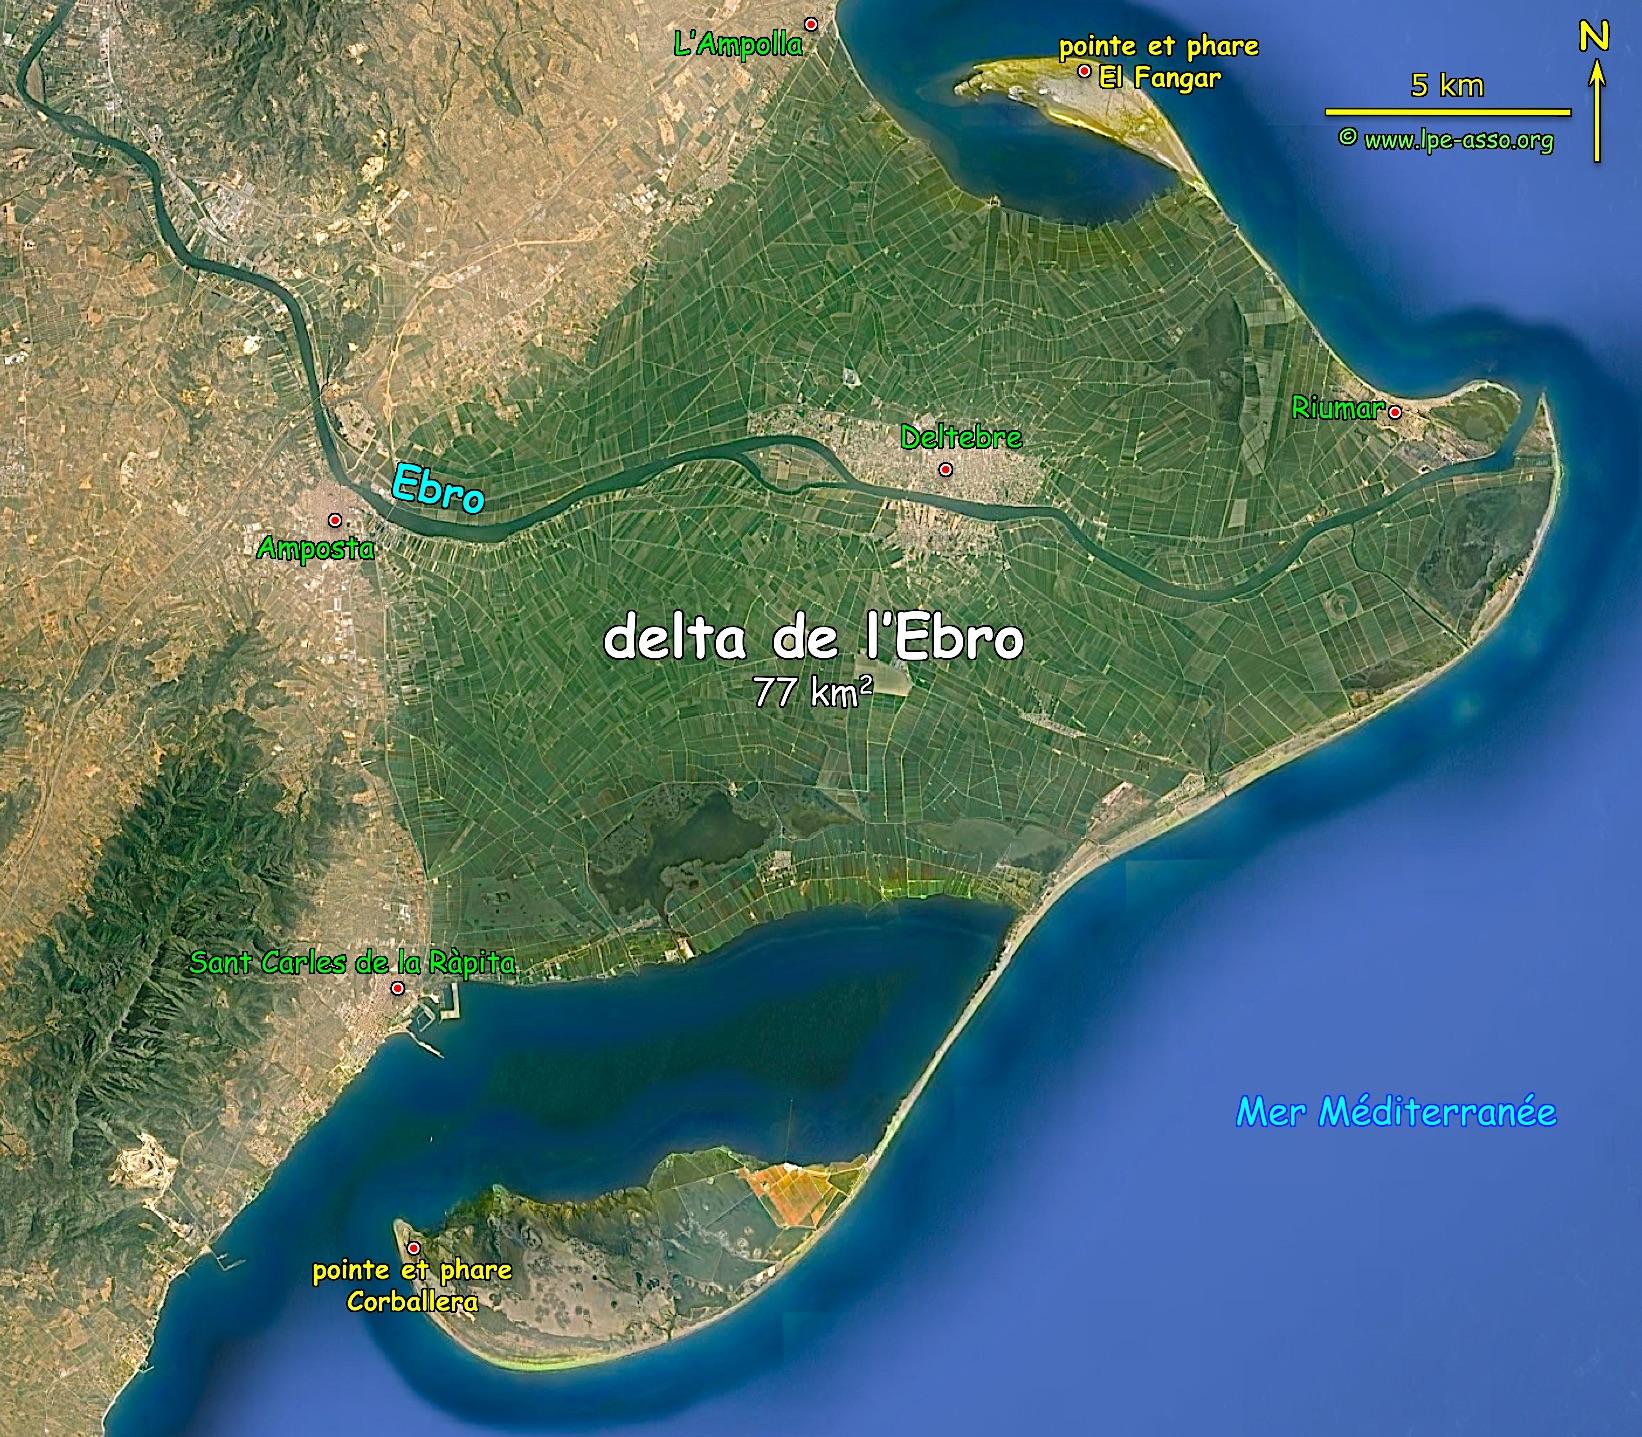 Carte Espagne Delta De Lebre.Rio Ebro Ligne De Partage